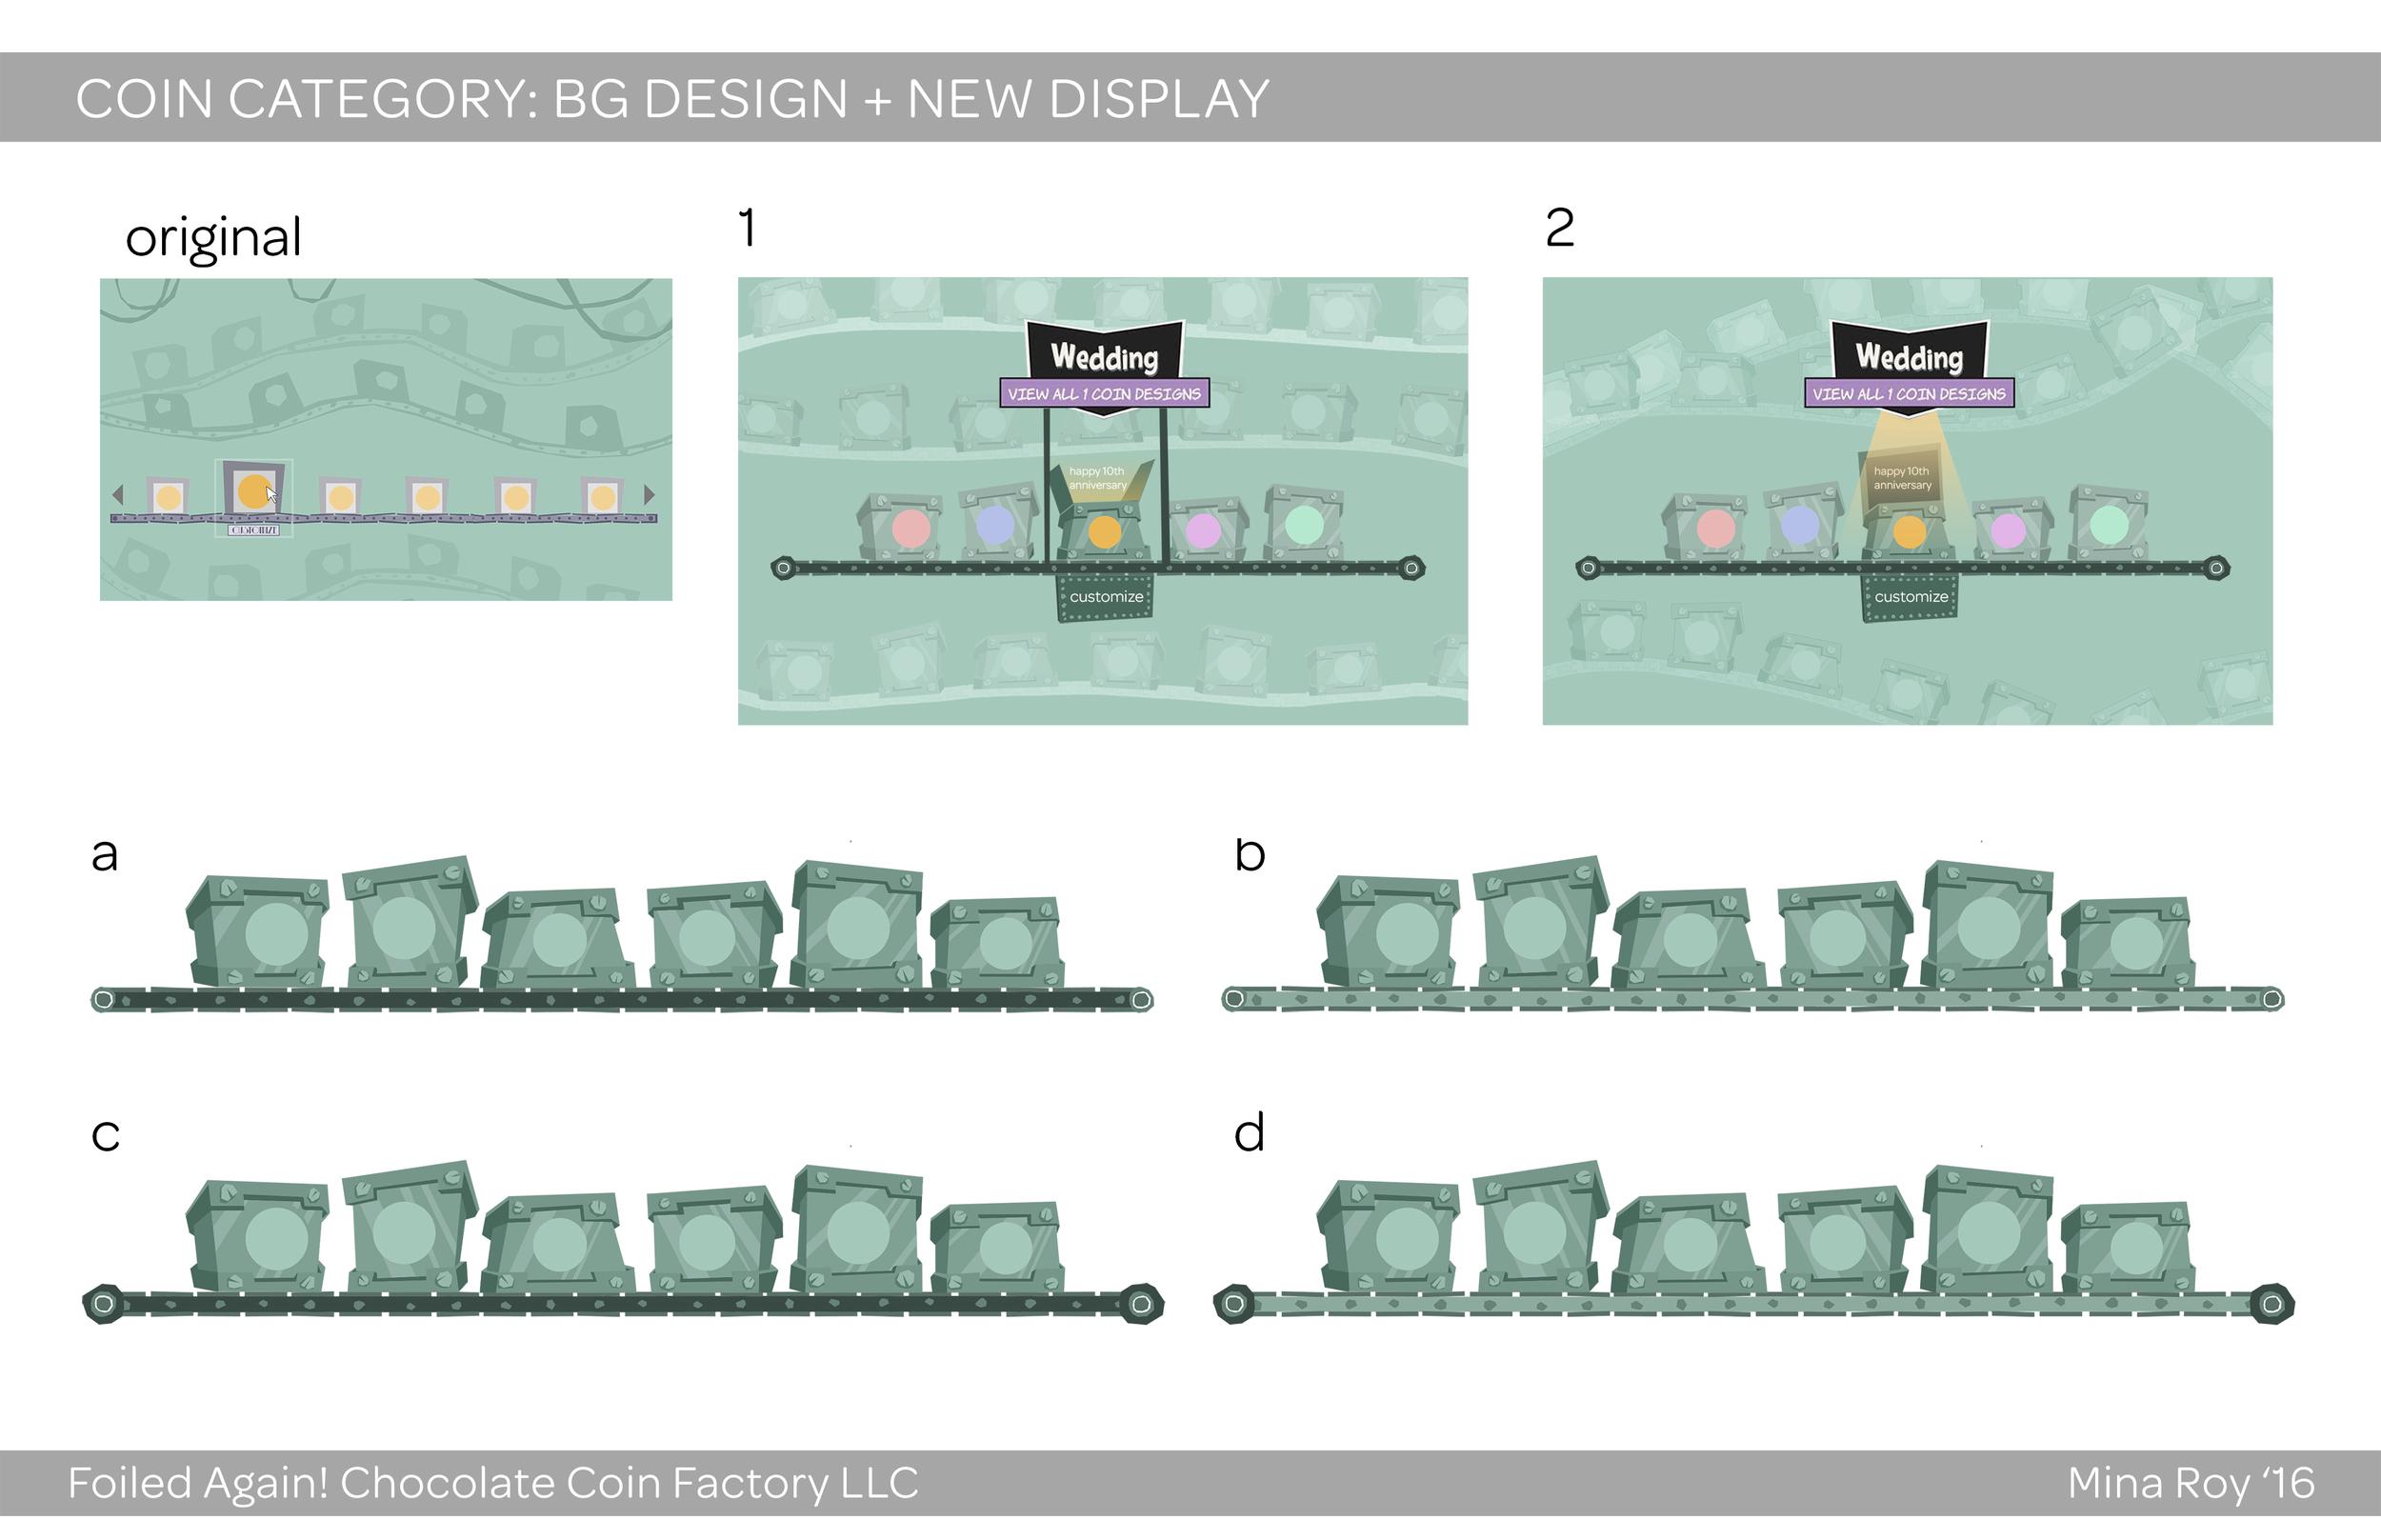 MinaRoy_FA_website-coincategory-bgdesign+newdisplay-8x12.jpg